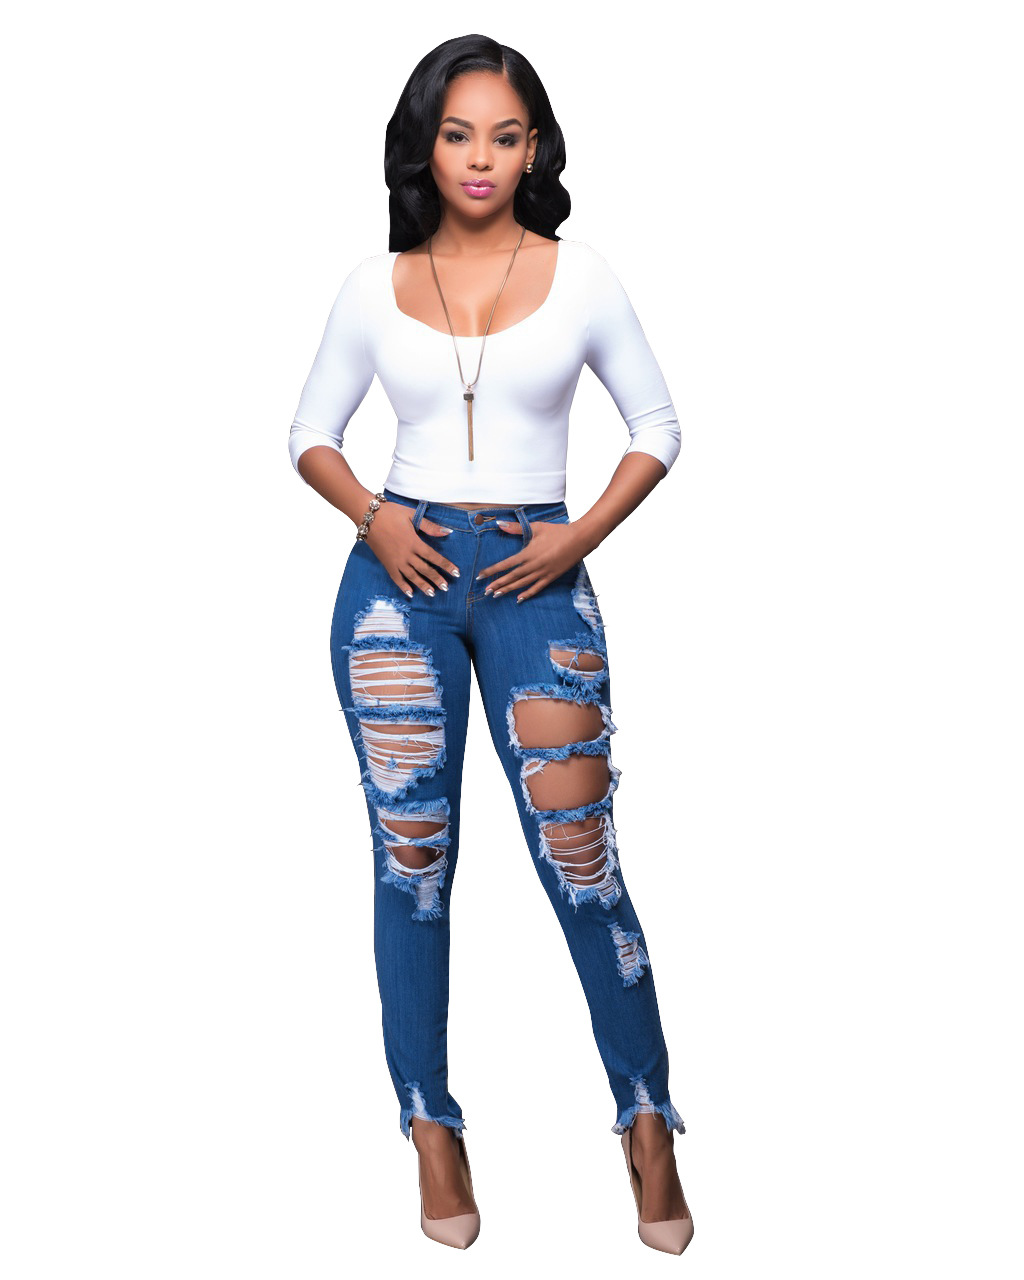 Women's Clothing Jeans Good Hole Ripped Jeans Women Pants Cool Denim Pencil Jeans For Girl Pants Andrea Mendes Arroio Deiama Miami Beach Brazilian Brunette